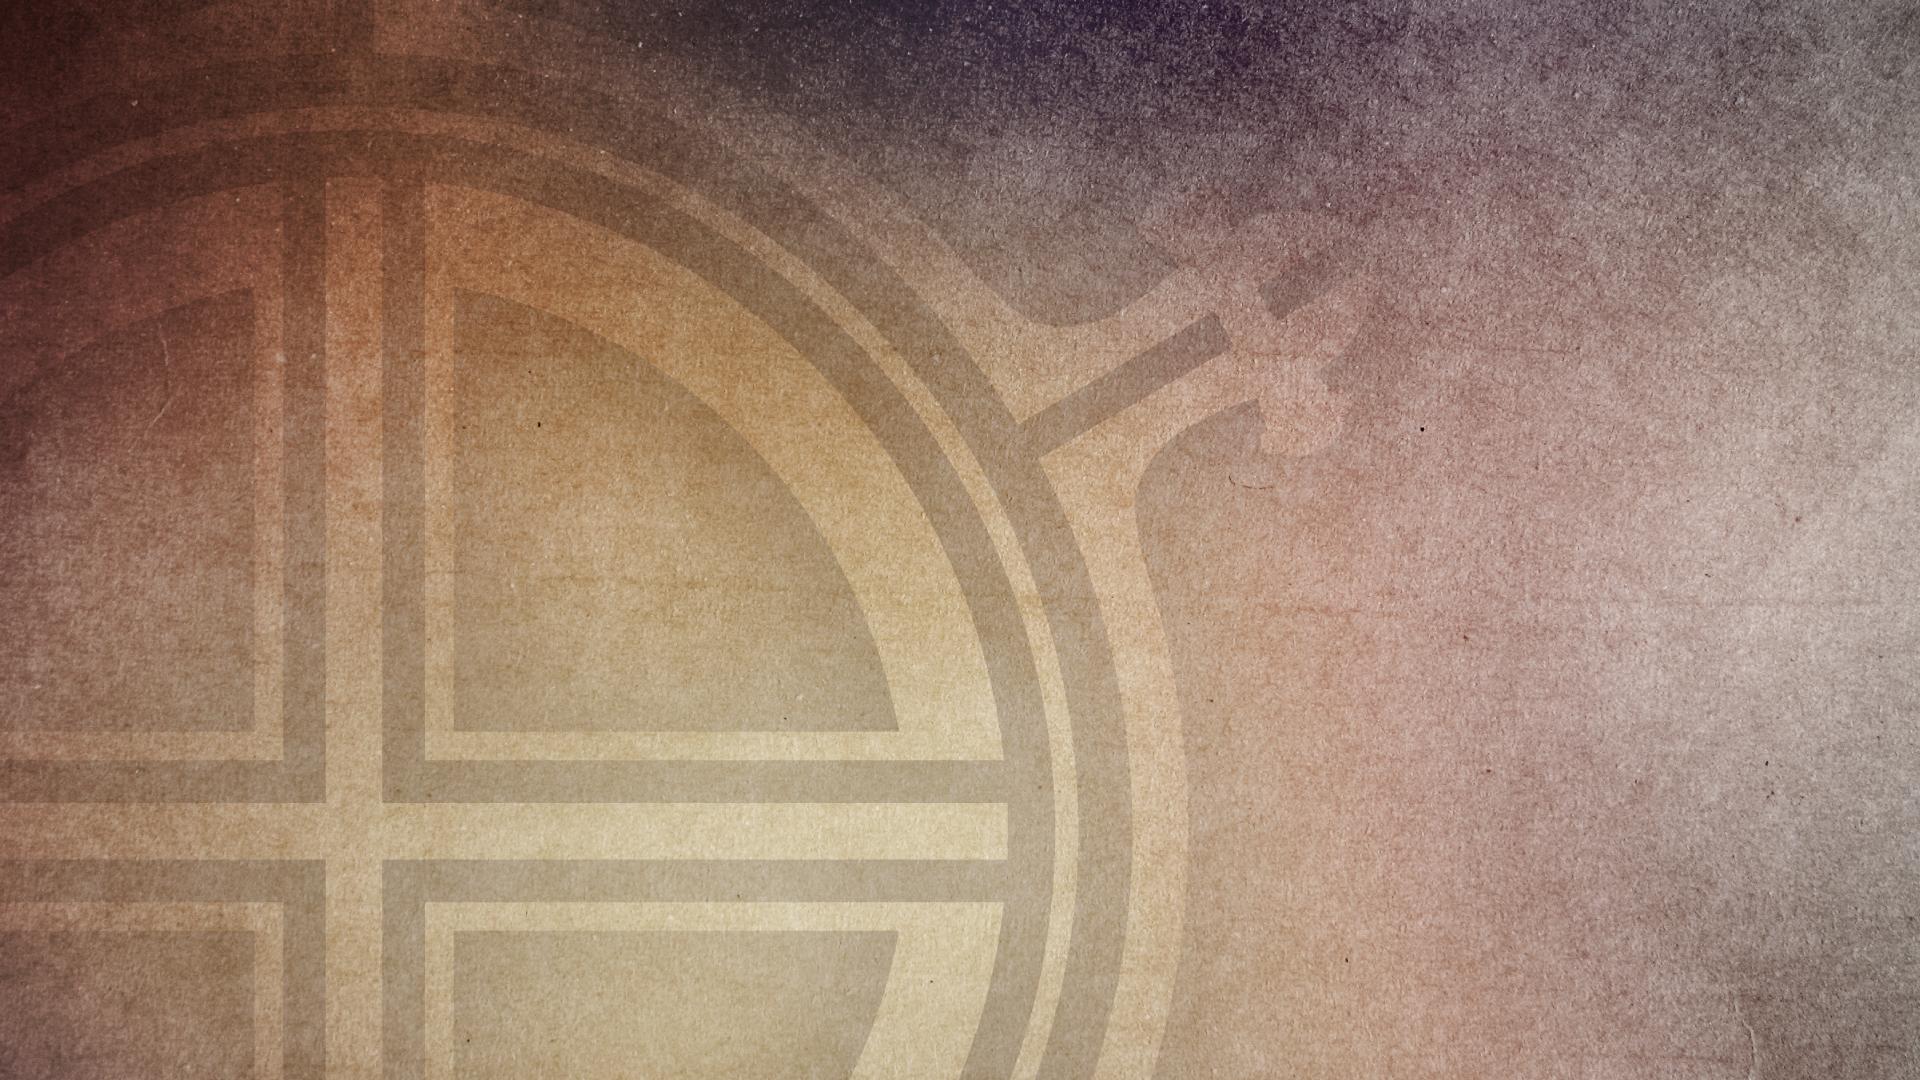 logo_2.0_final11.20_CROSS.jpg